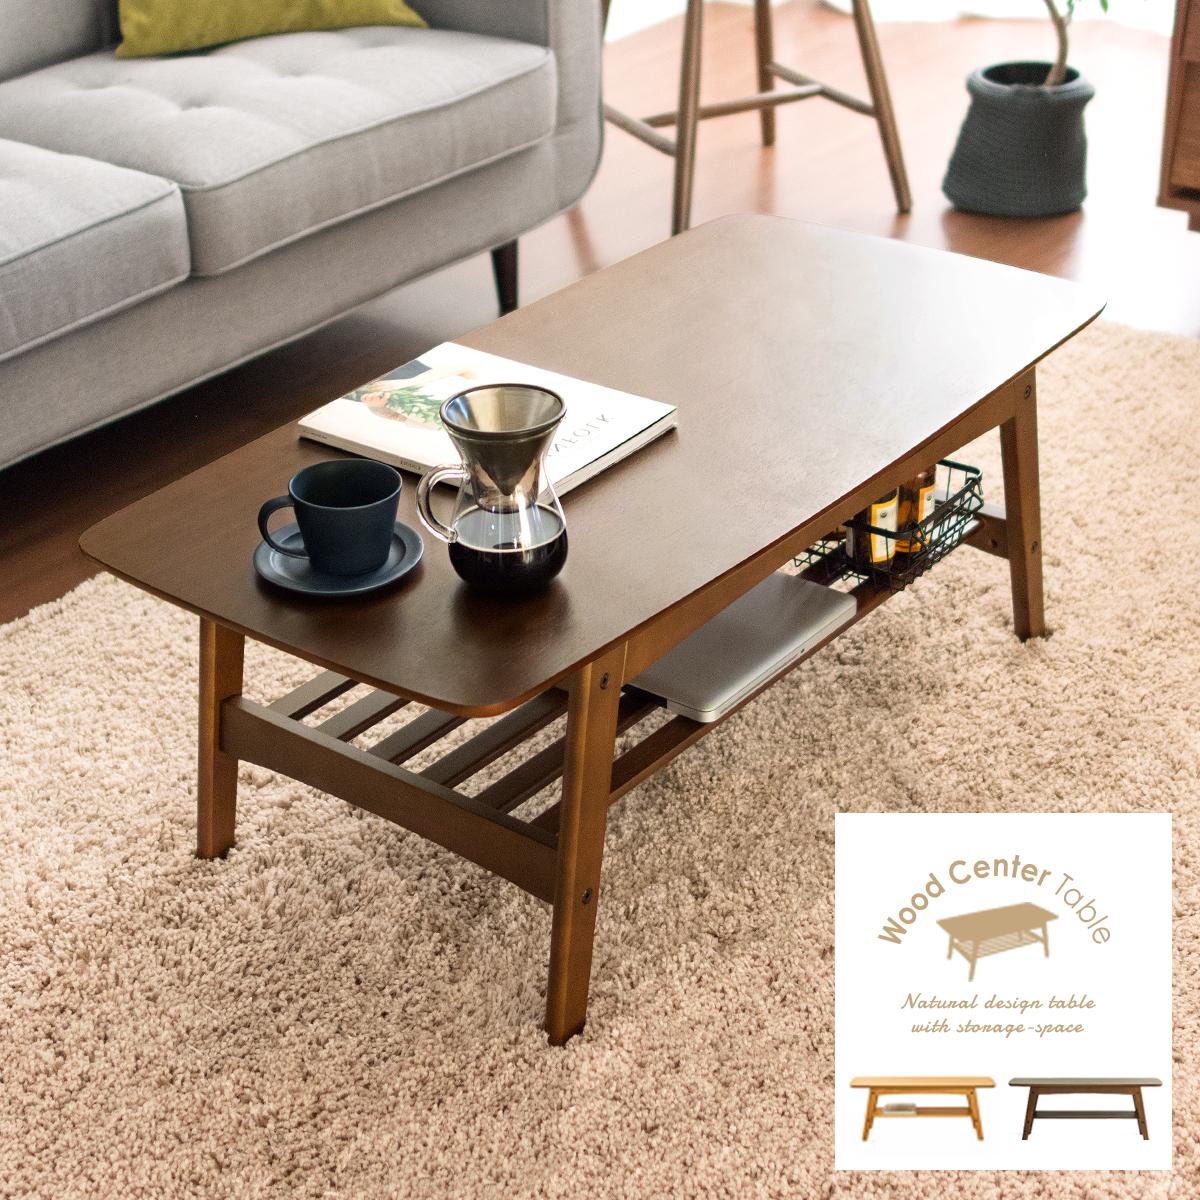 Living Room Table Design Wooden - Home Design Ideas